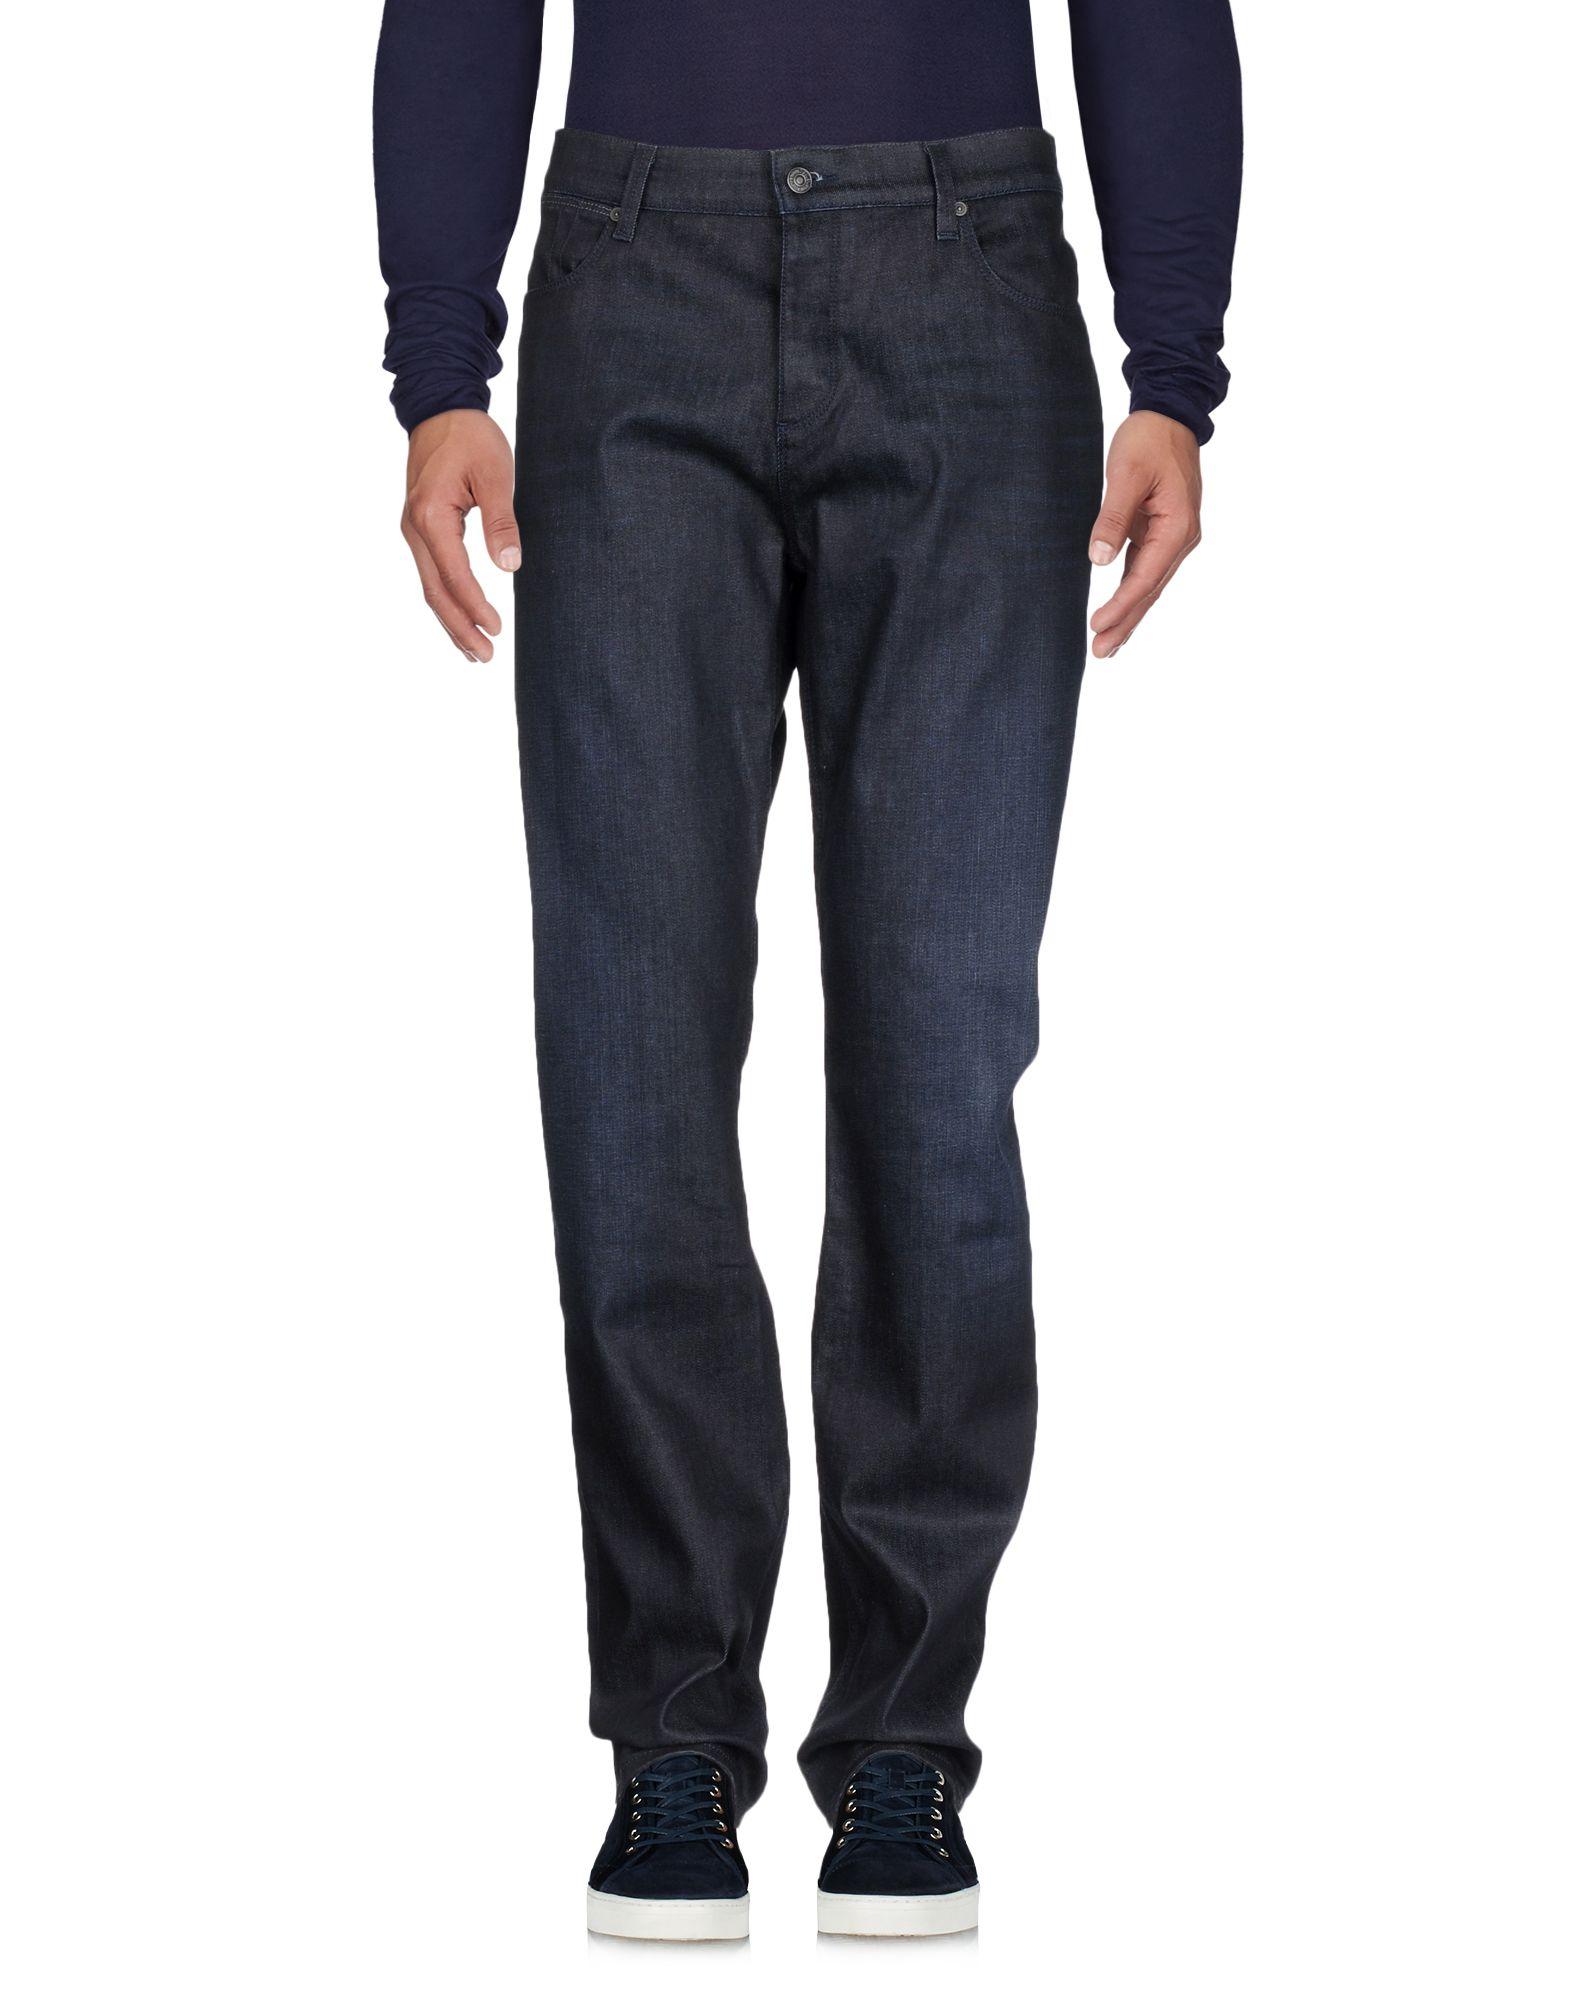 Pantaloni Jeans 7 For All Mankind Uomo - - Uomo 42669140KO a56a11